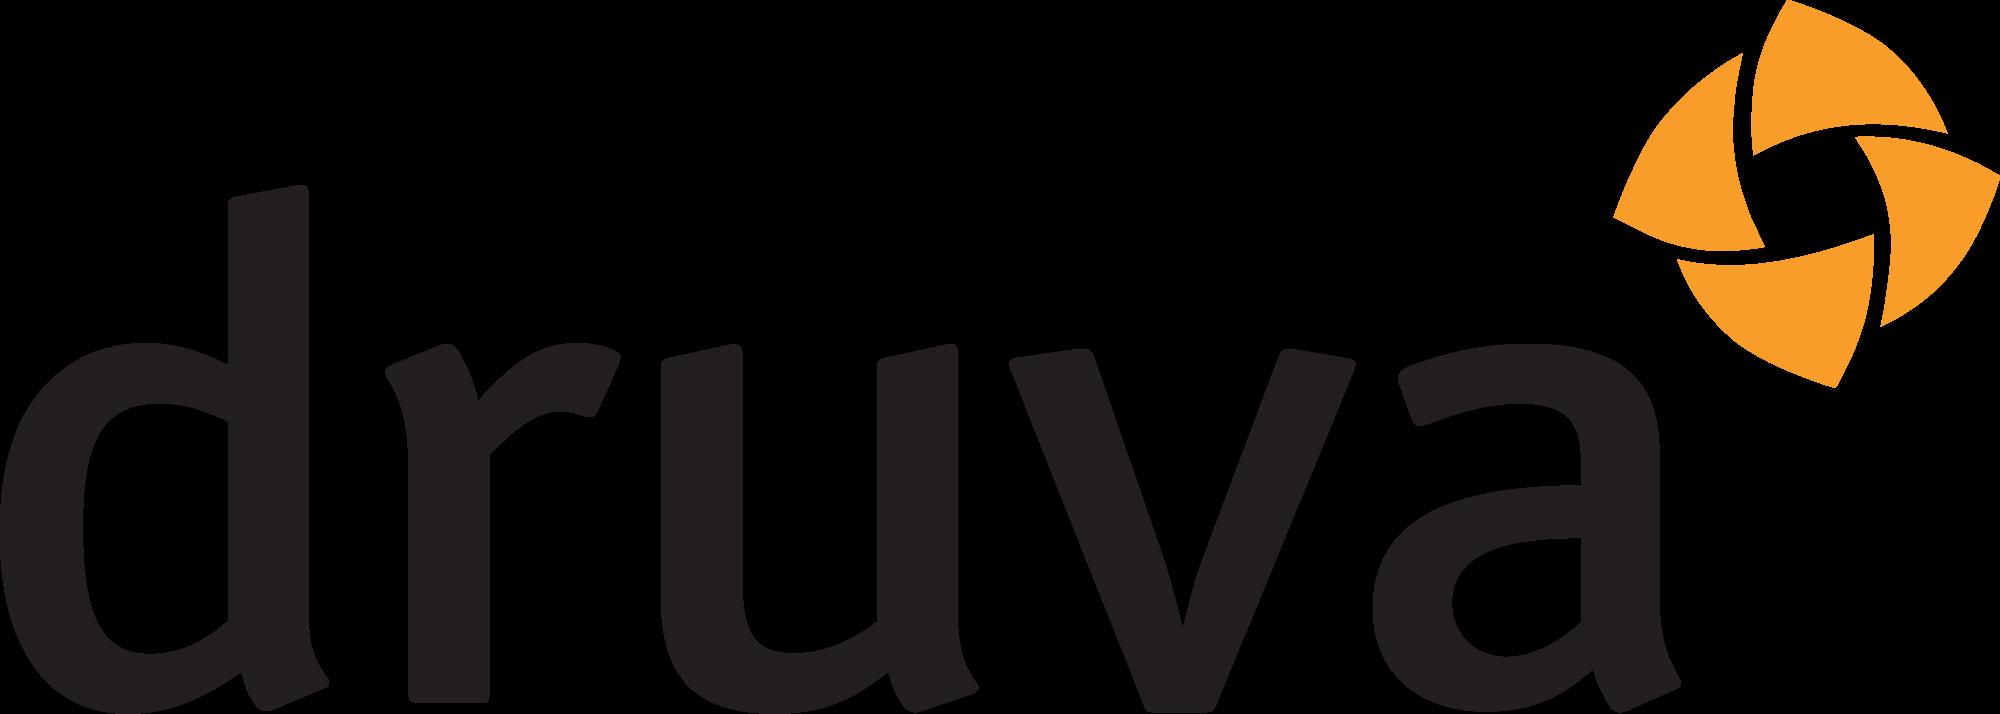 druva-logo-black-notm-notag.png